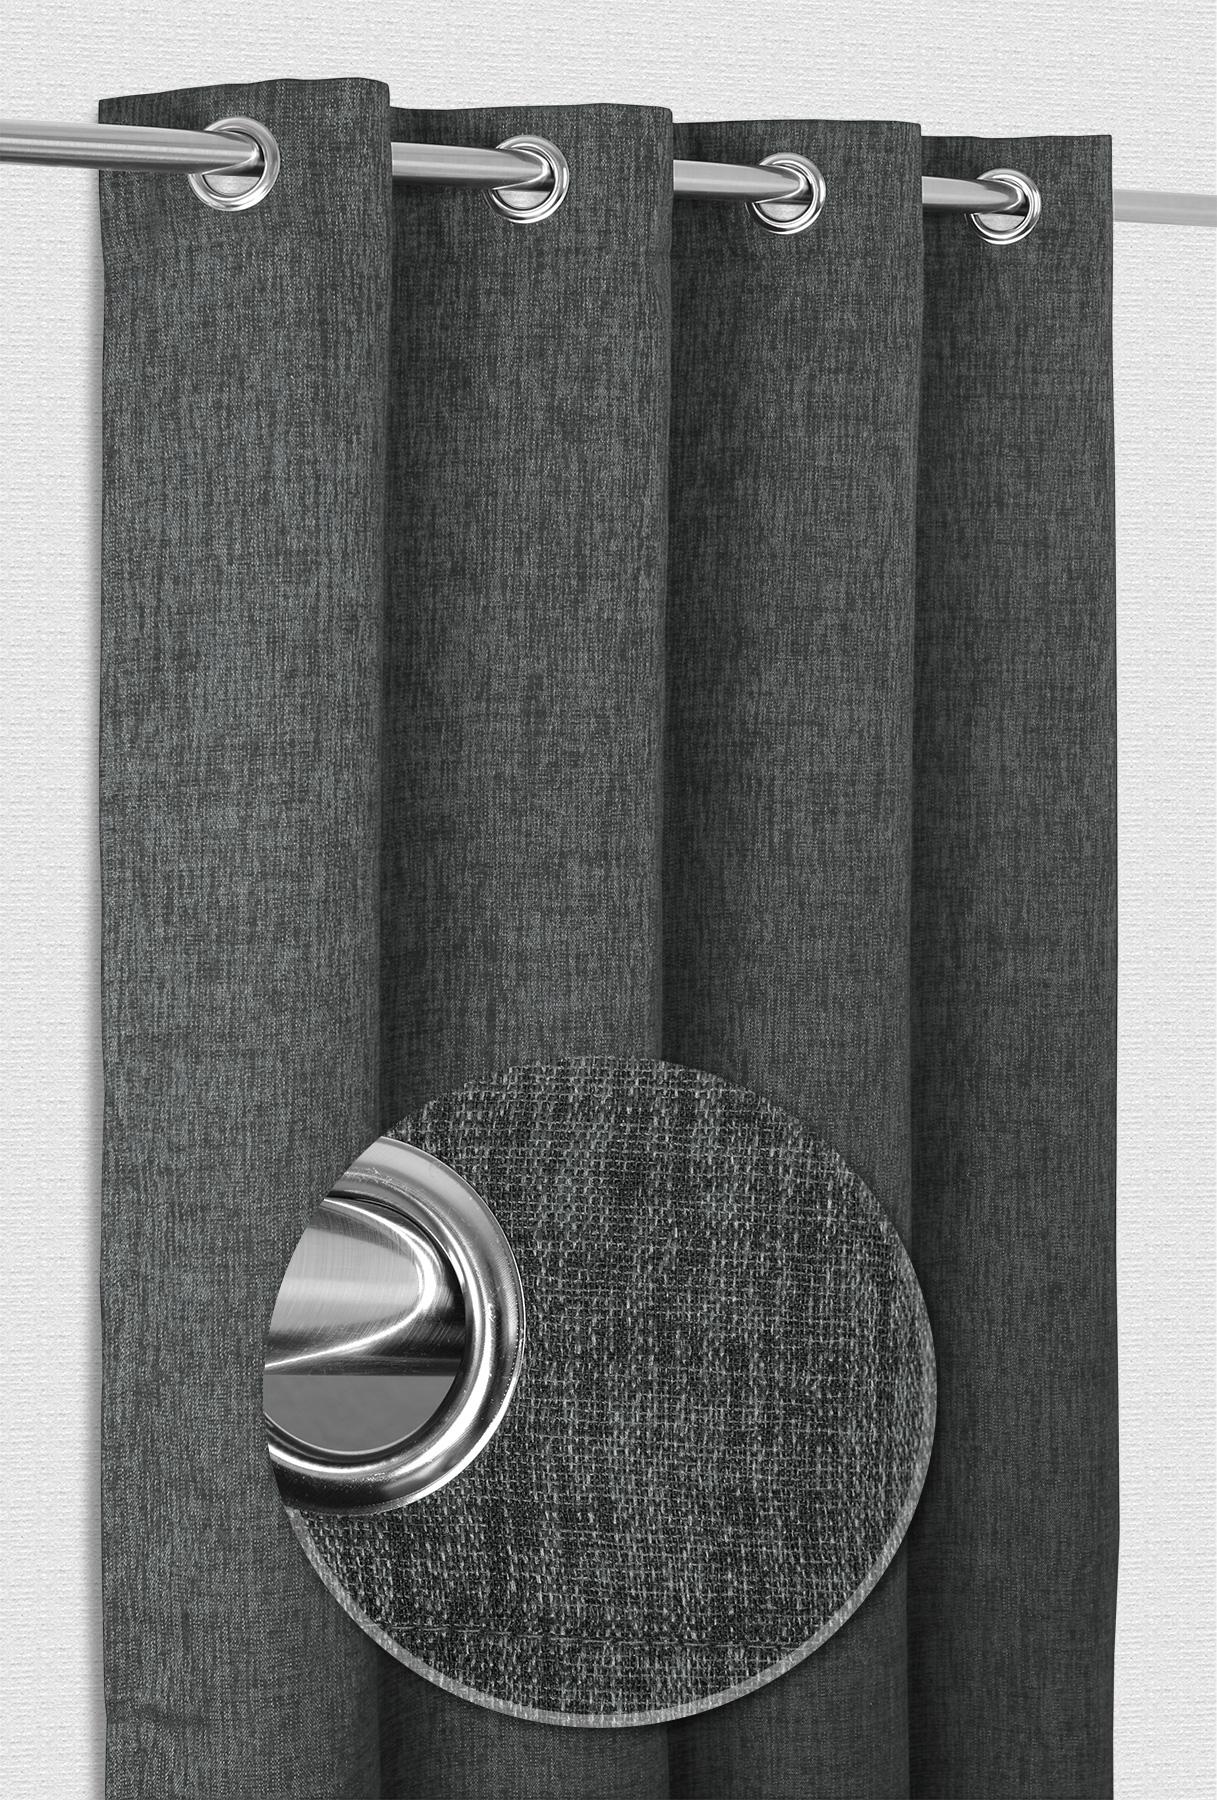 Cathrine Ösenvorhang, Gardine Mit Ösen 140x245 Cm, Ösenschal Blickdicht  Farbe Wählbar